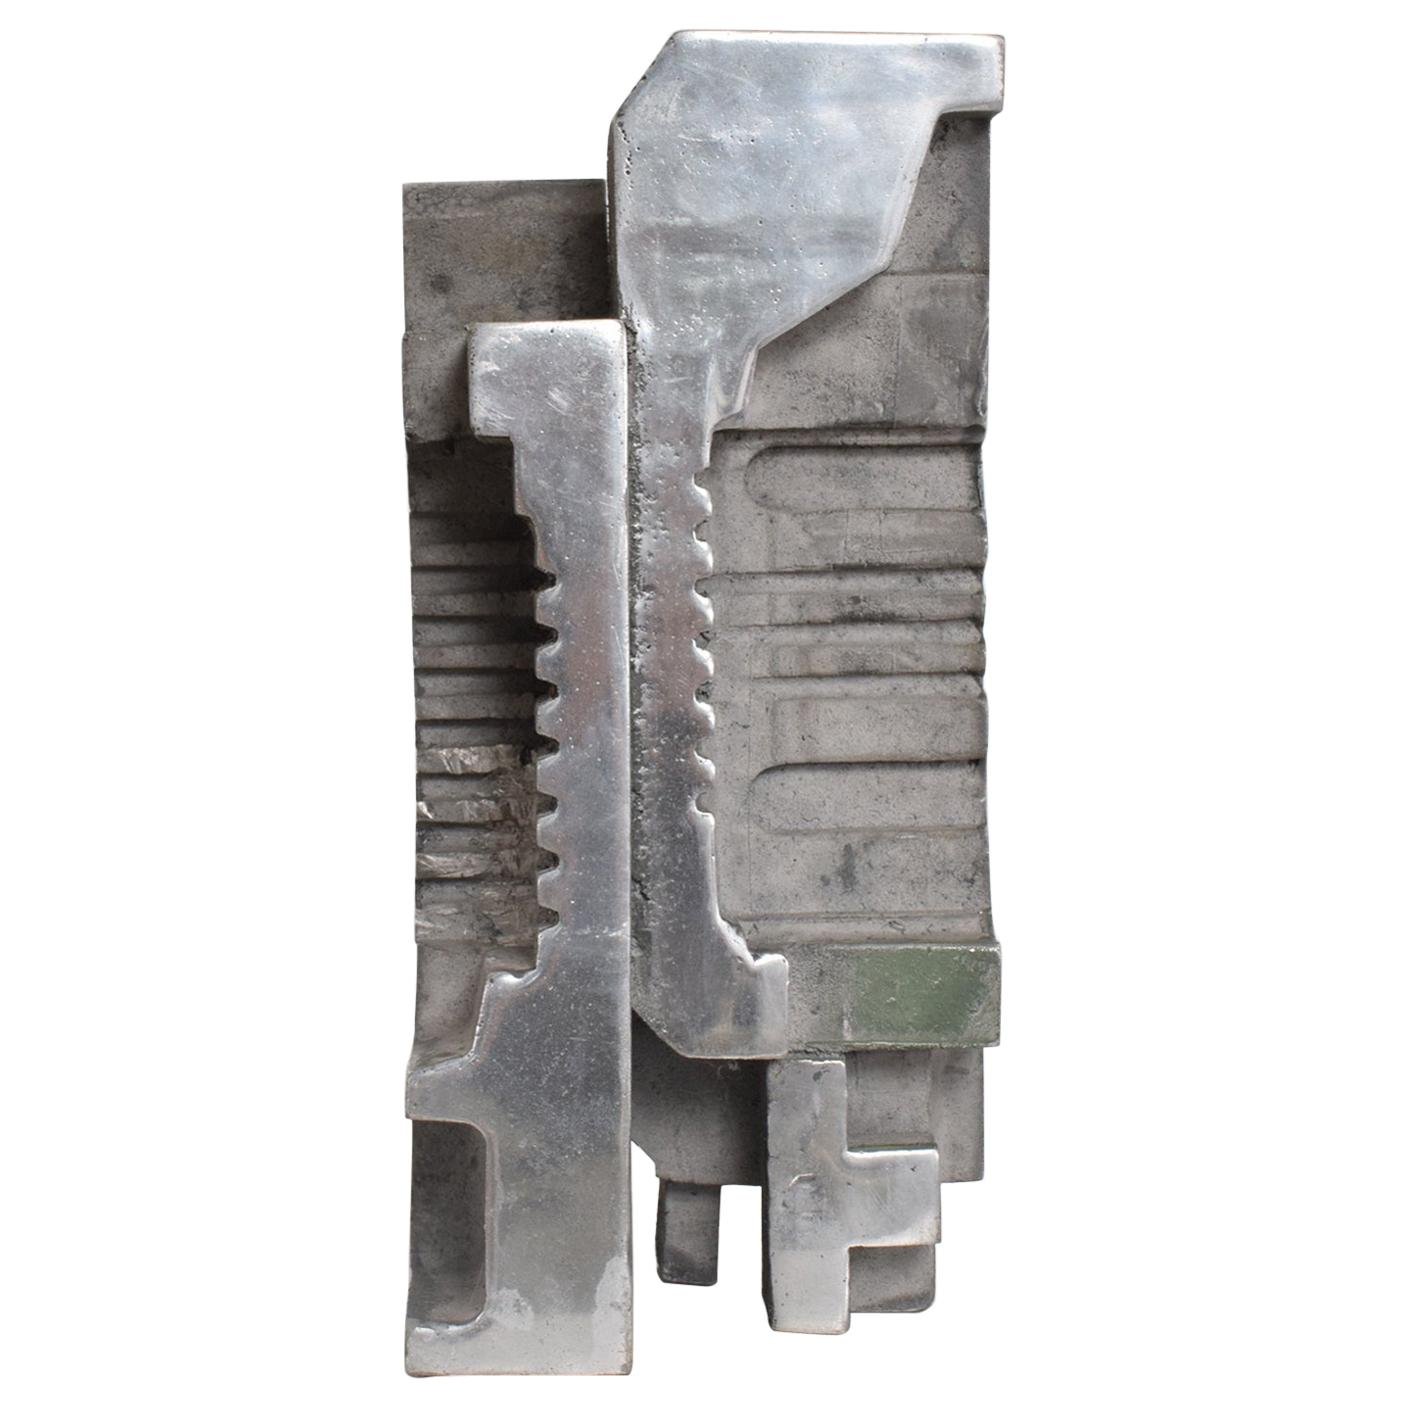 Cast Aluminum Brutalist Sculpture by Myrna M. Nobile Mid-Century Modern, 1969